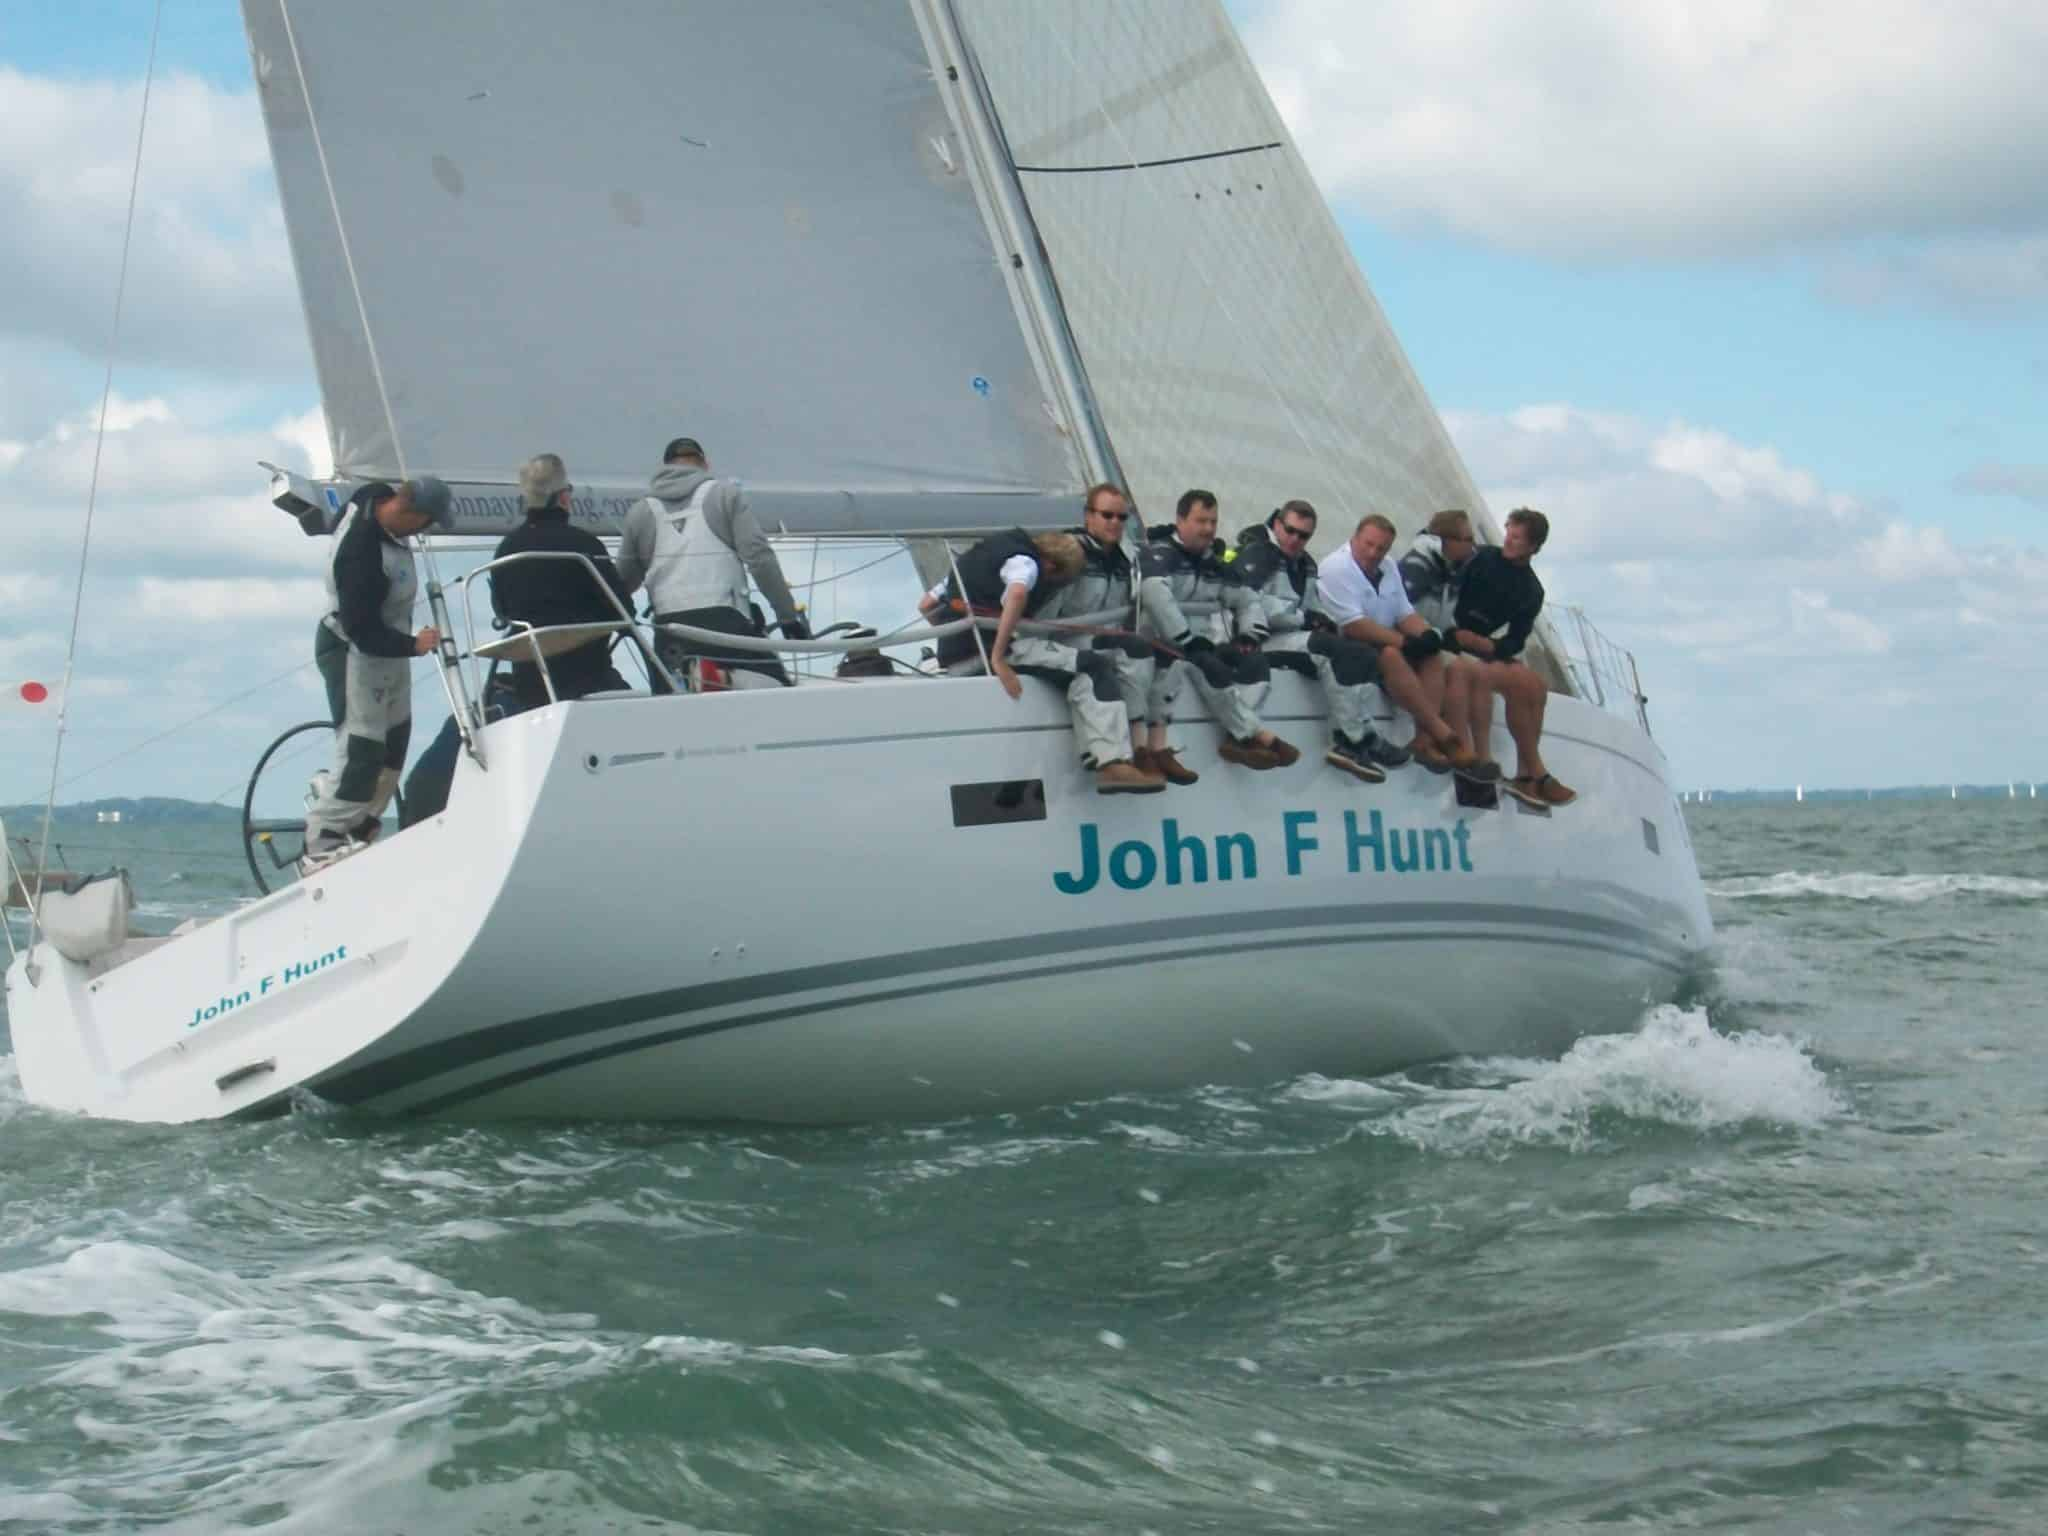 John F Hunt boat